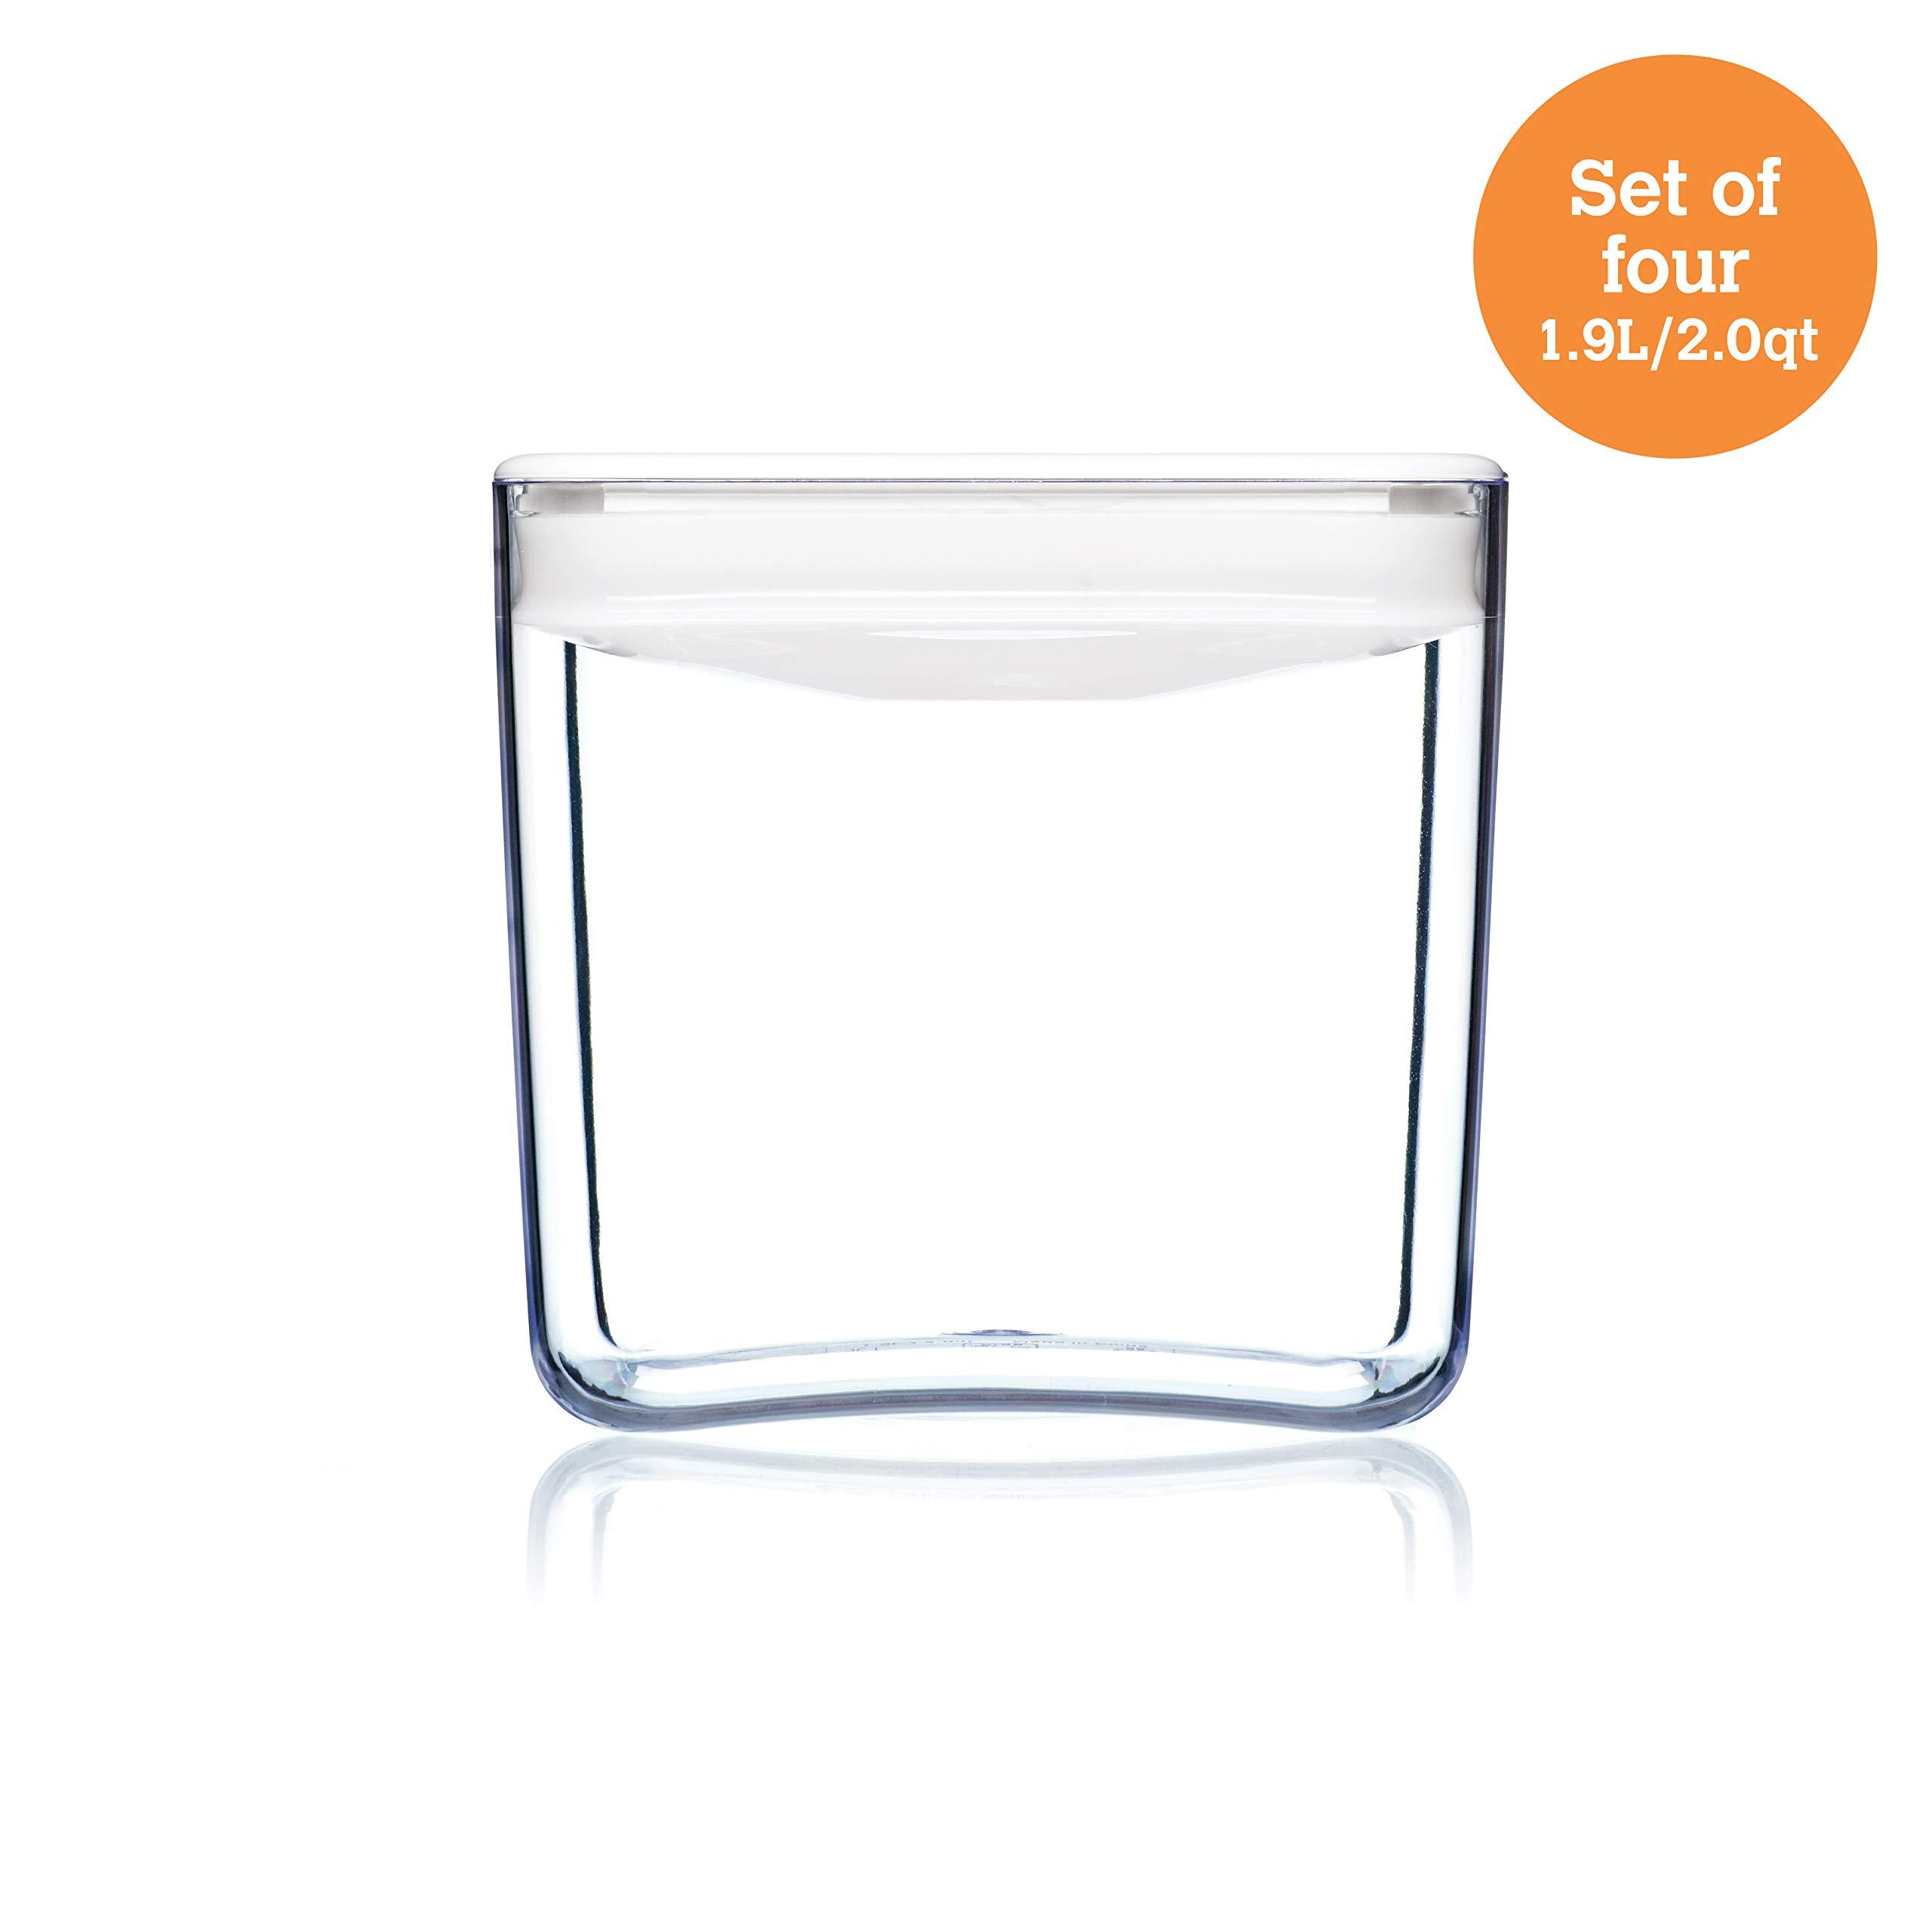 ClickClack Cube Food Storage/Display Canister, 2 qt, Set of 4